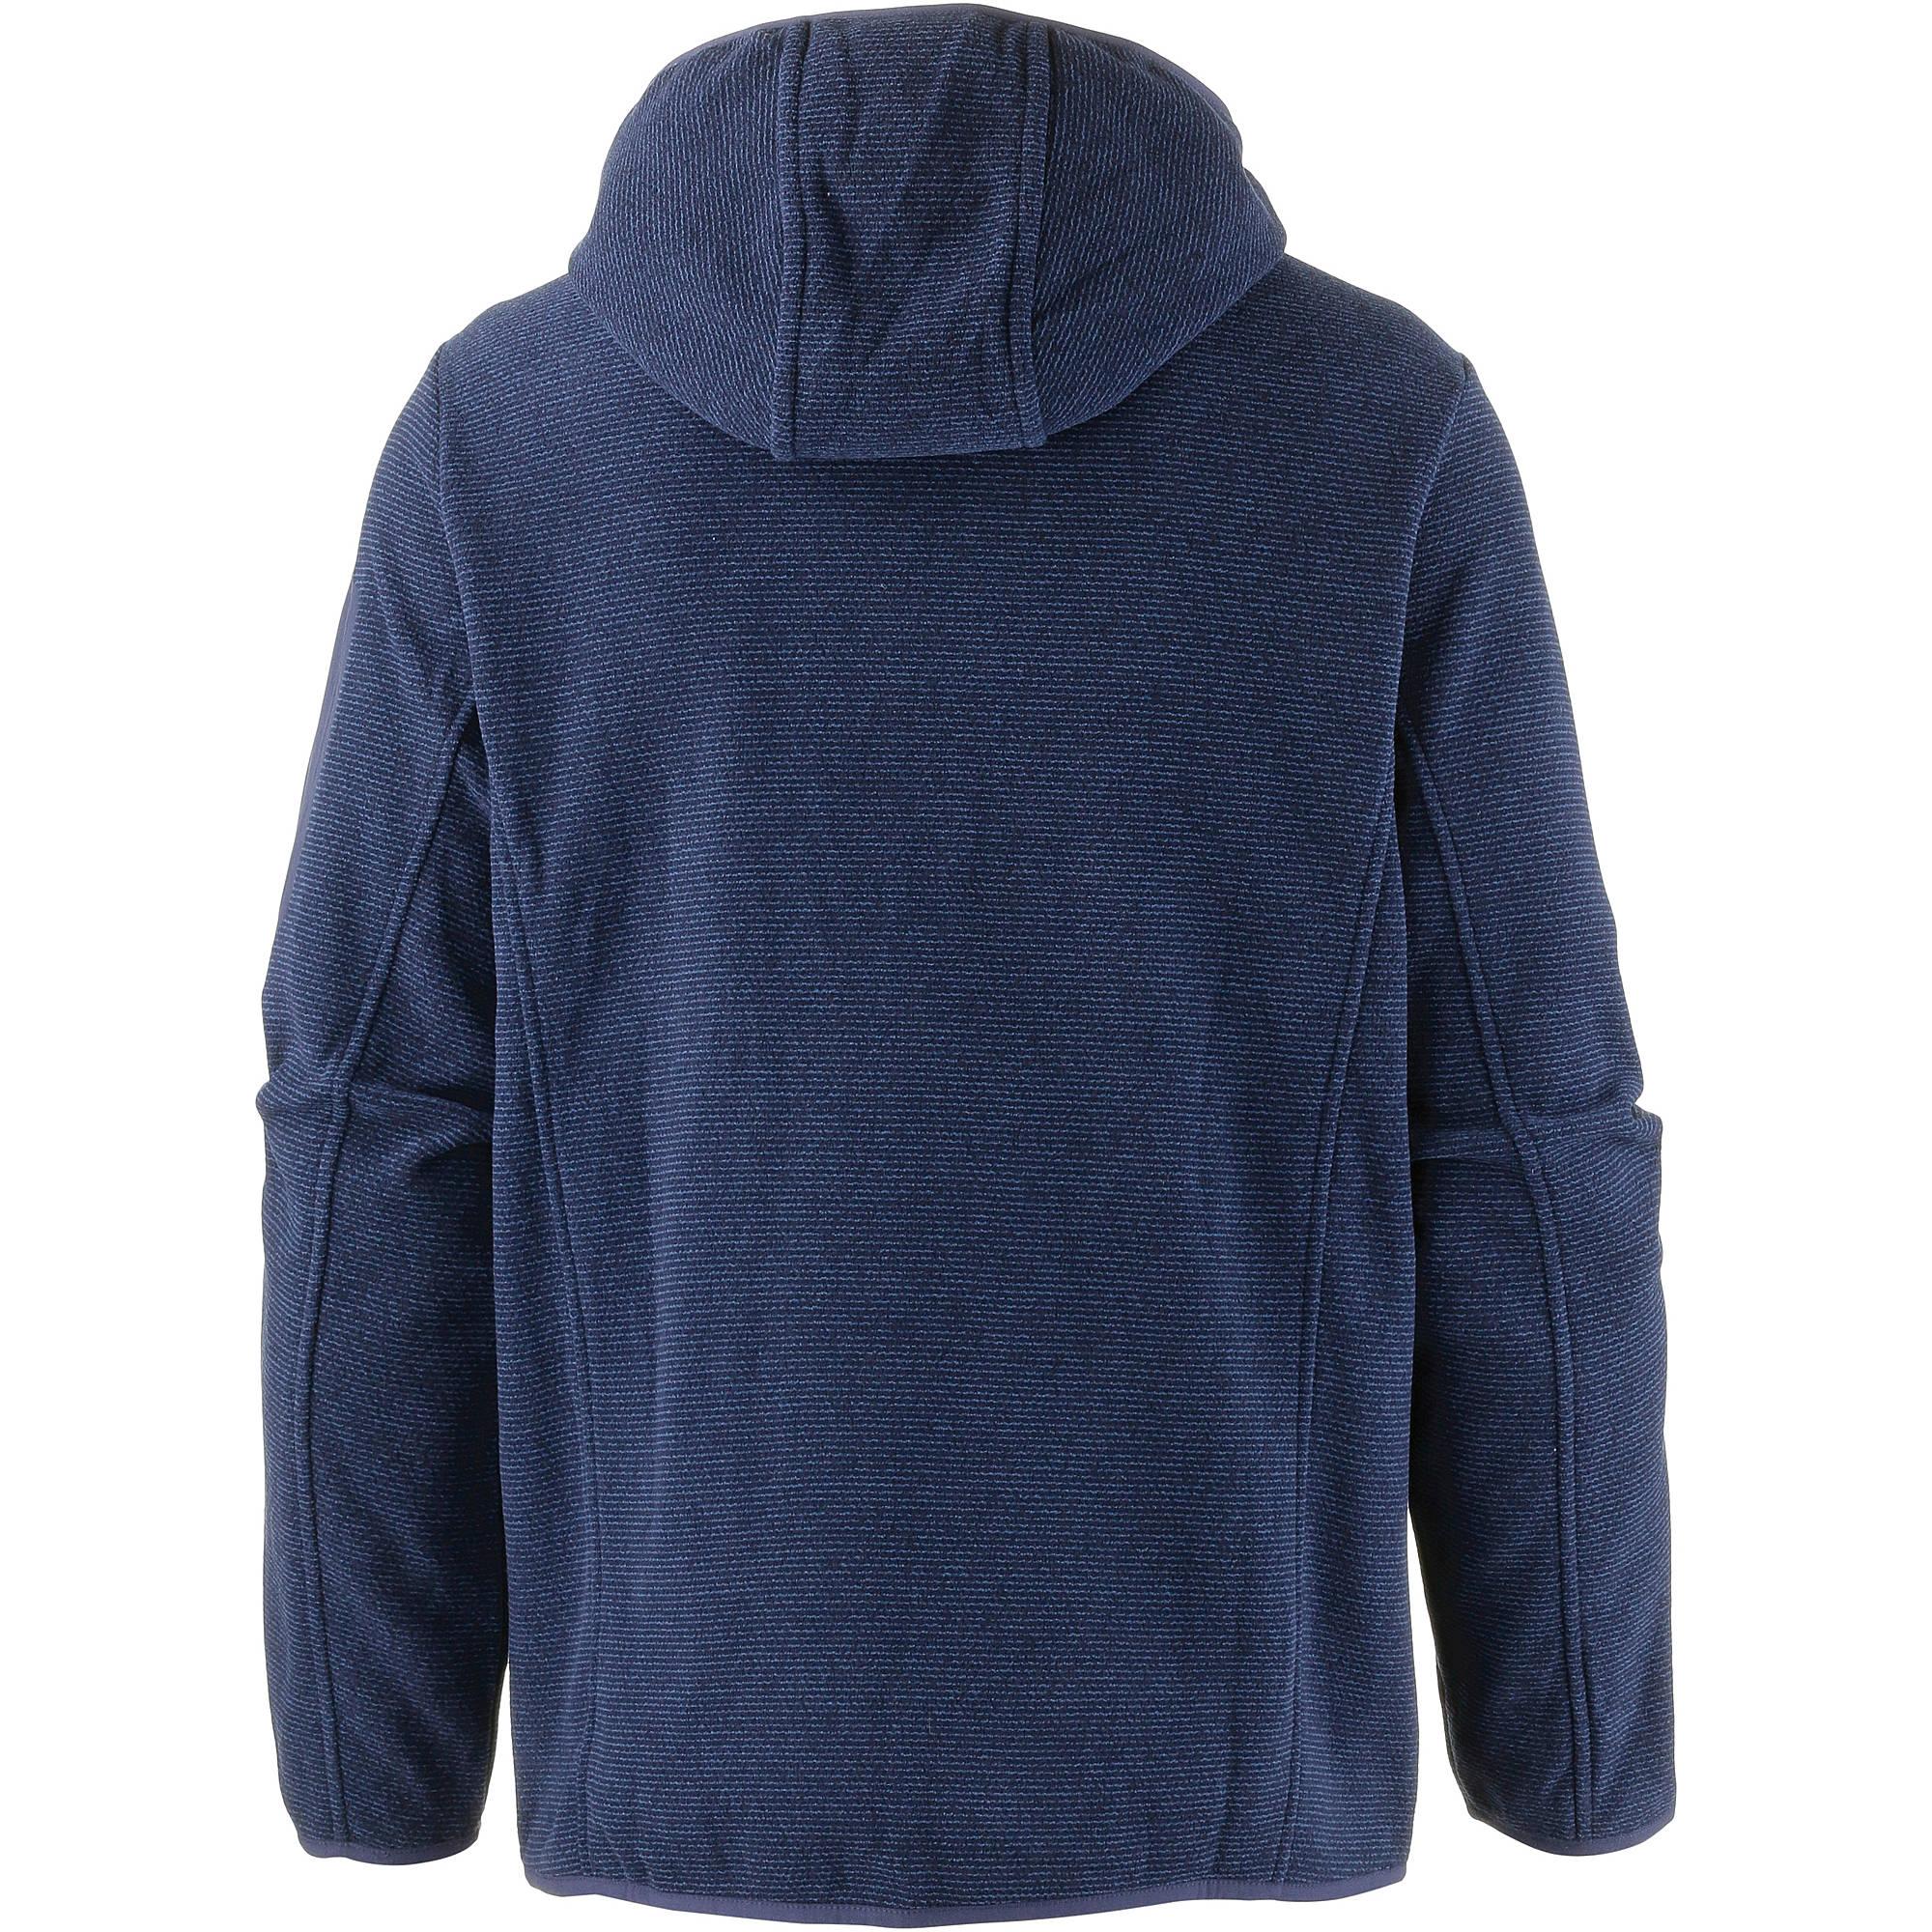 CMP CMP CMP Man Jacket Fix Hood (38H2227) - Herren Fleecejacke dfd63f